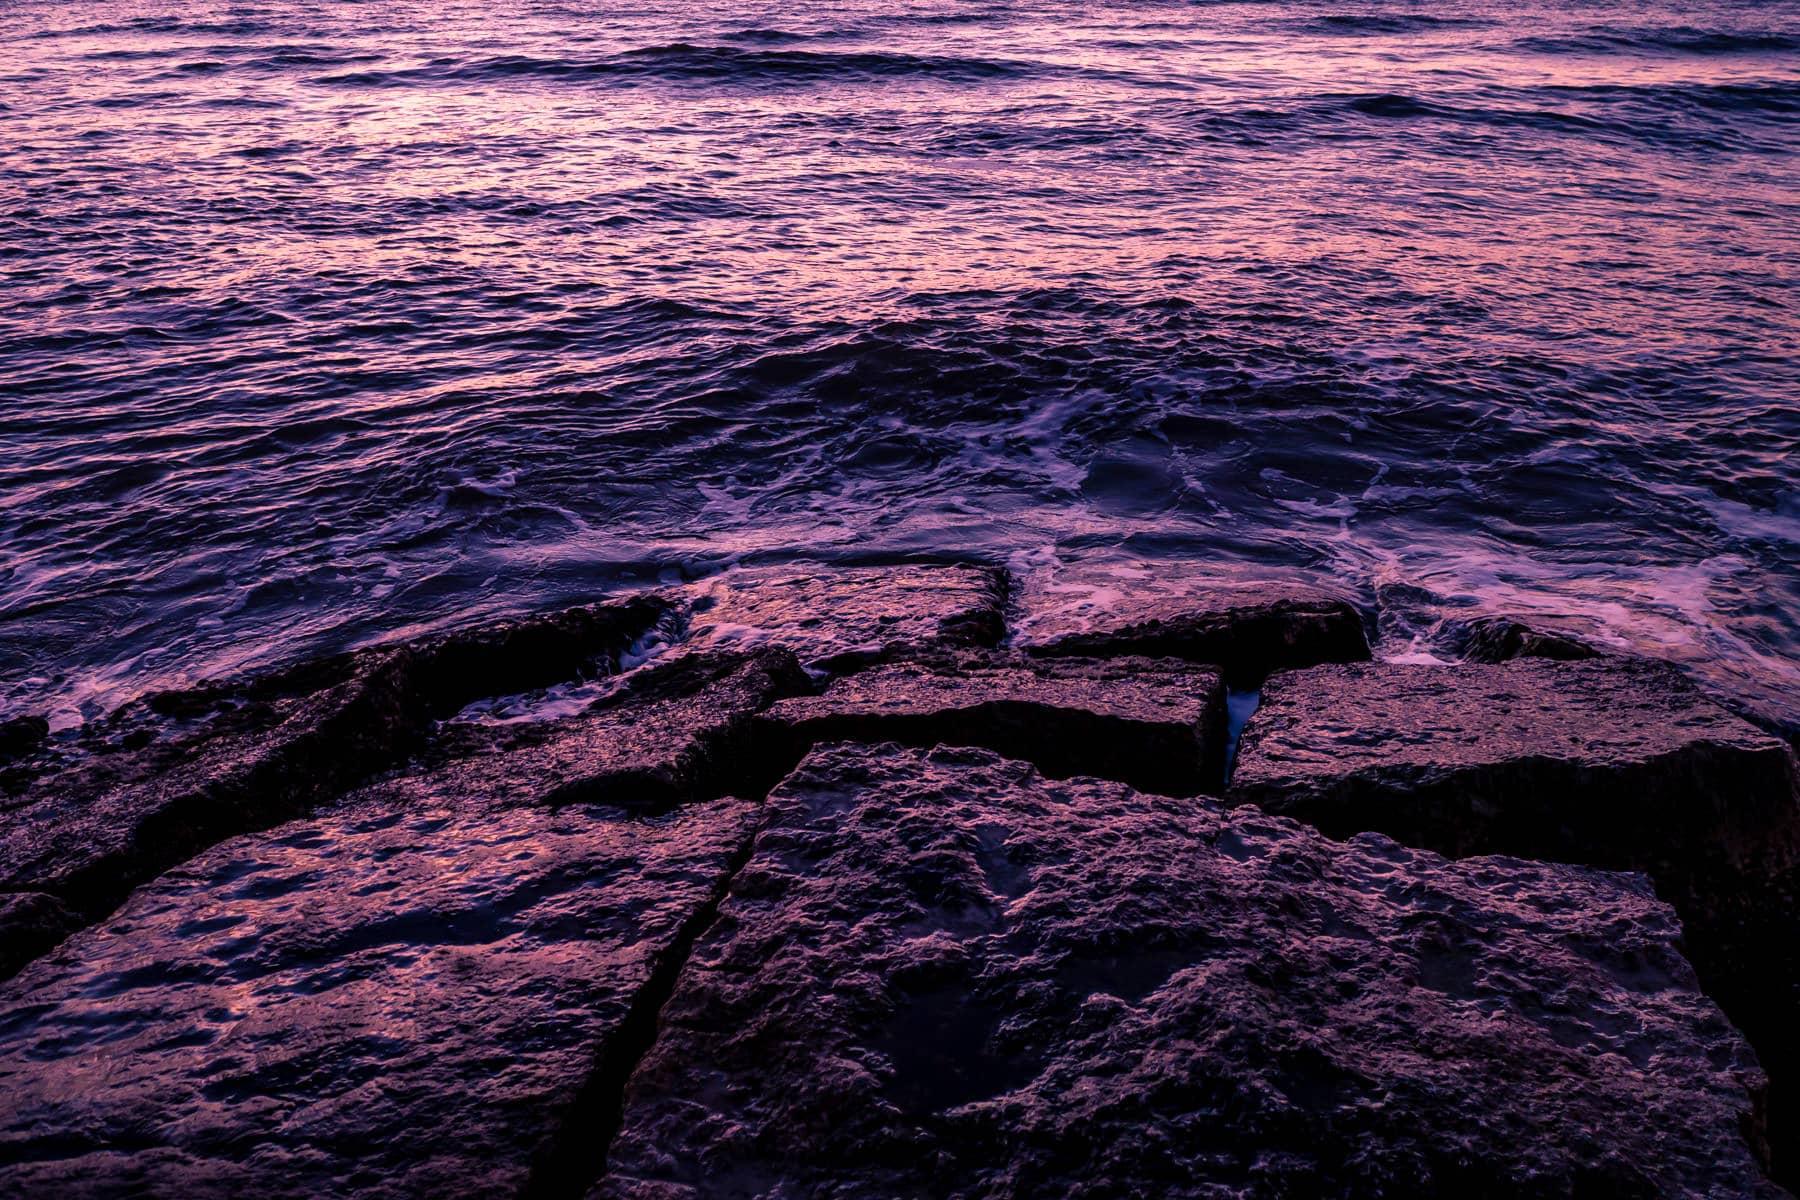 The Gulf of Mexico surf crashes onto granite blocks as the sun rises on the Galveston Island beach, Texas.